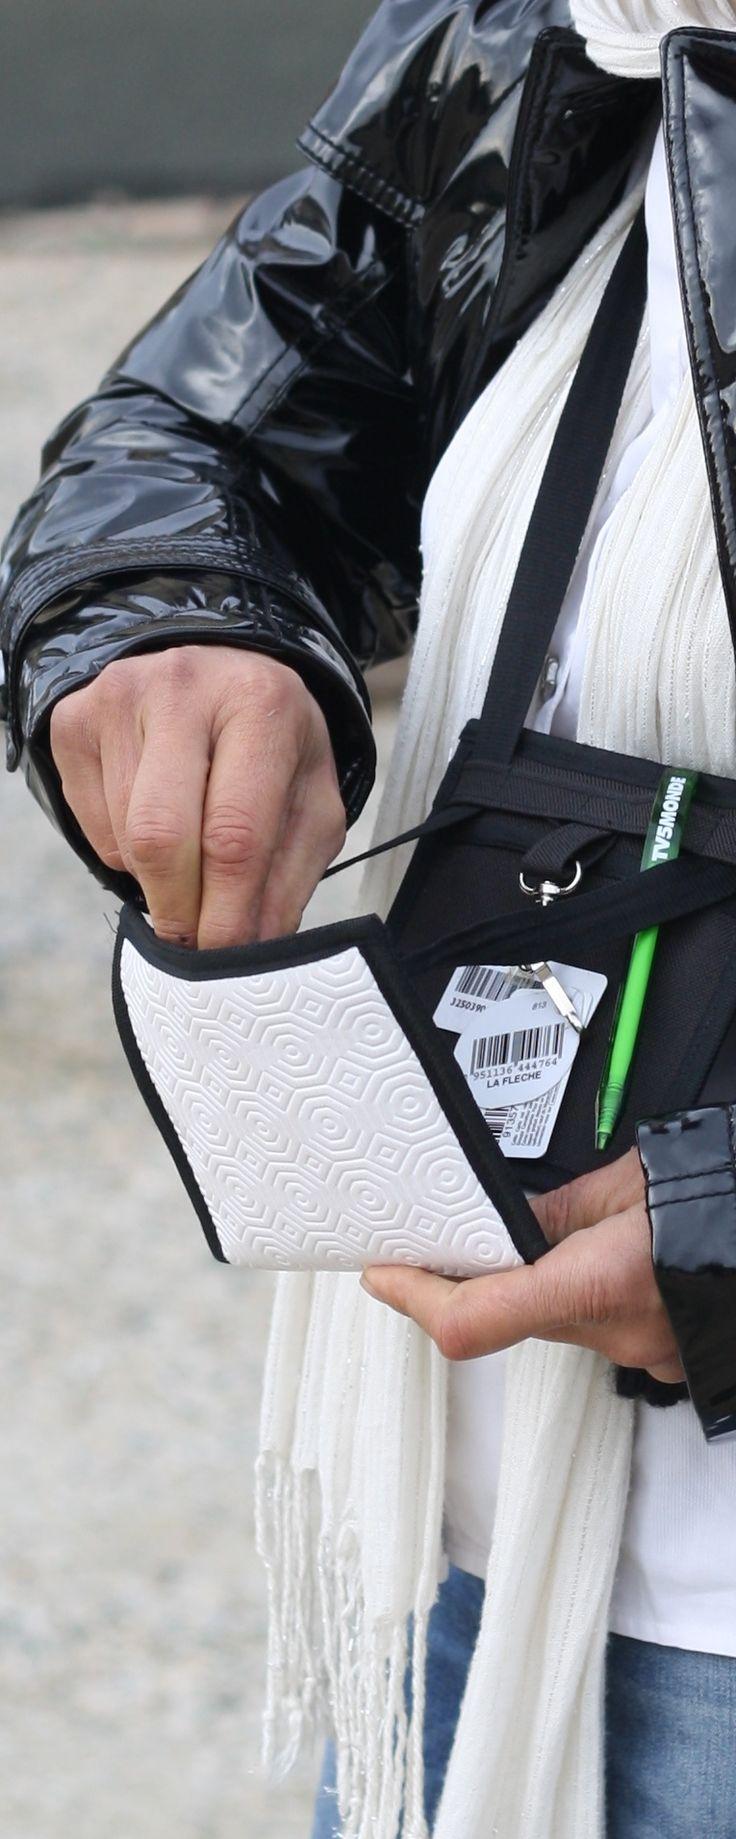 ~ Ti Sac Bulgomme ~  Un petit sac original en bulgomme / An original handbag in bulgomme ( table protection textile ) #minimal #astucieux #sac #bag #pochette-voyage #fanny-pack More > https://www.tisac.shop